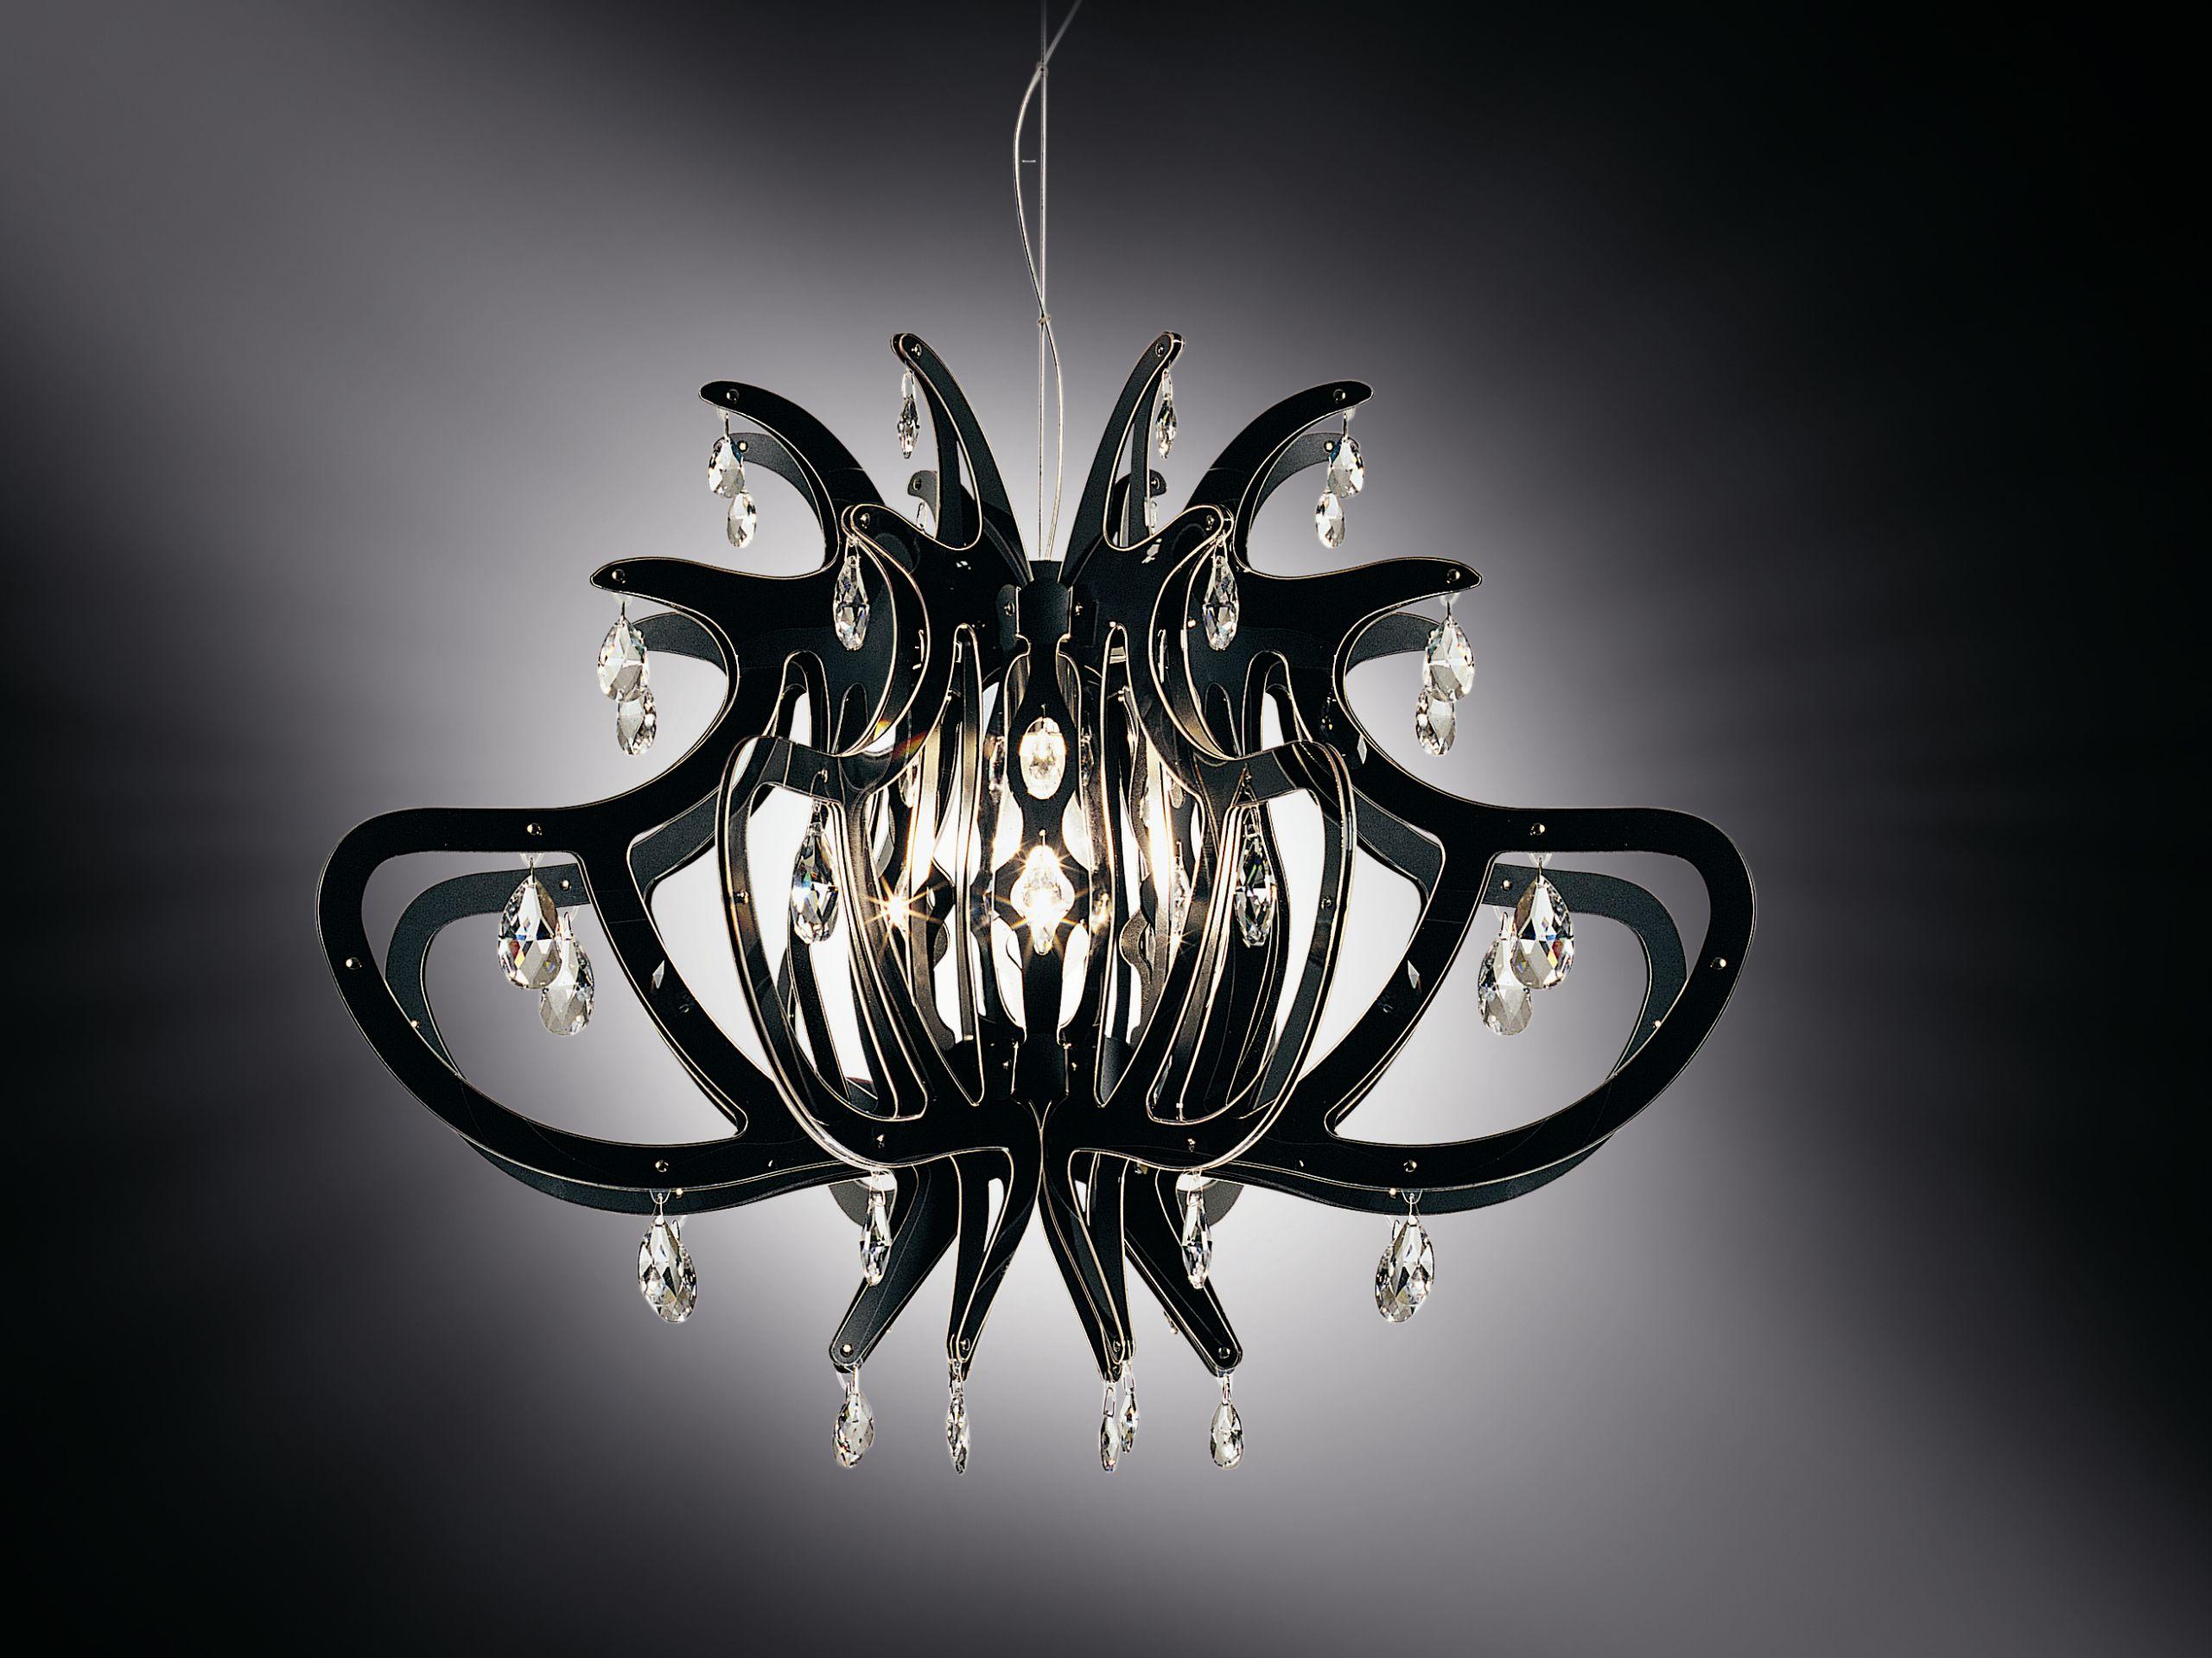 Medusa lampada a sospensione by slamp design nigel coates - Lampada sospensione design ...